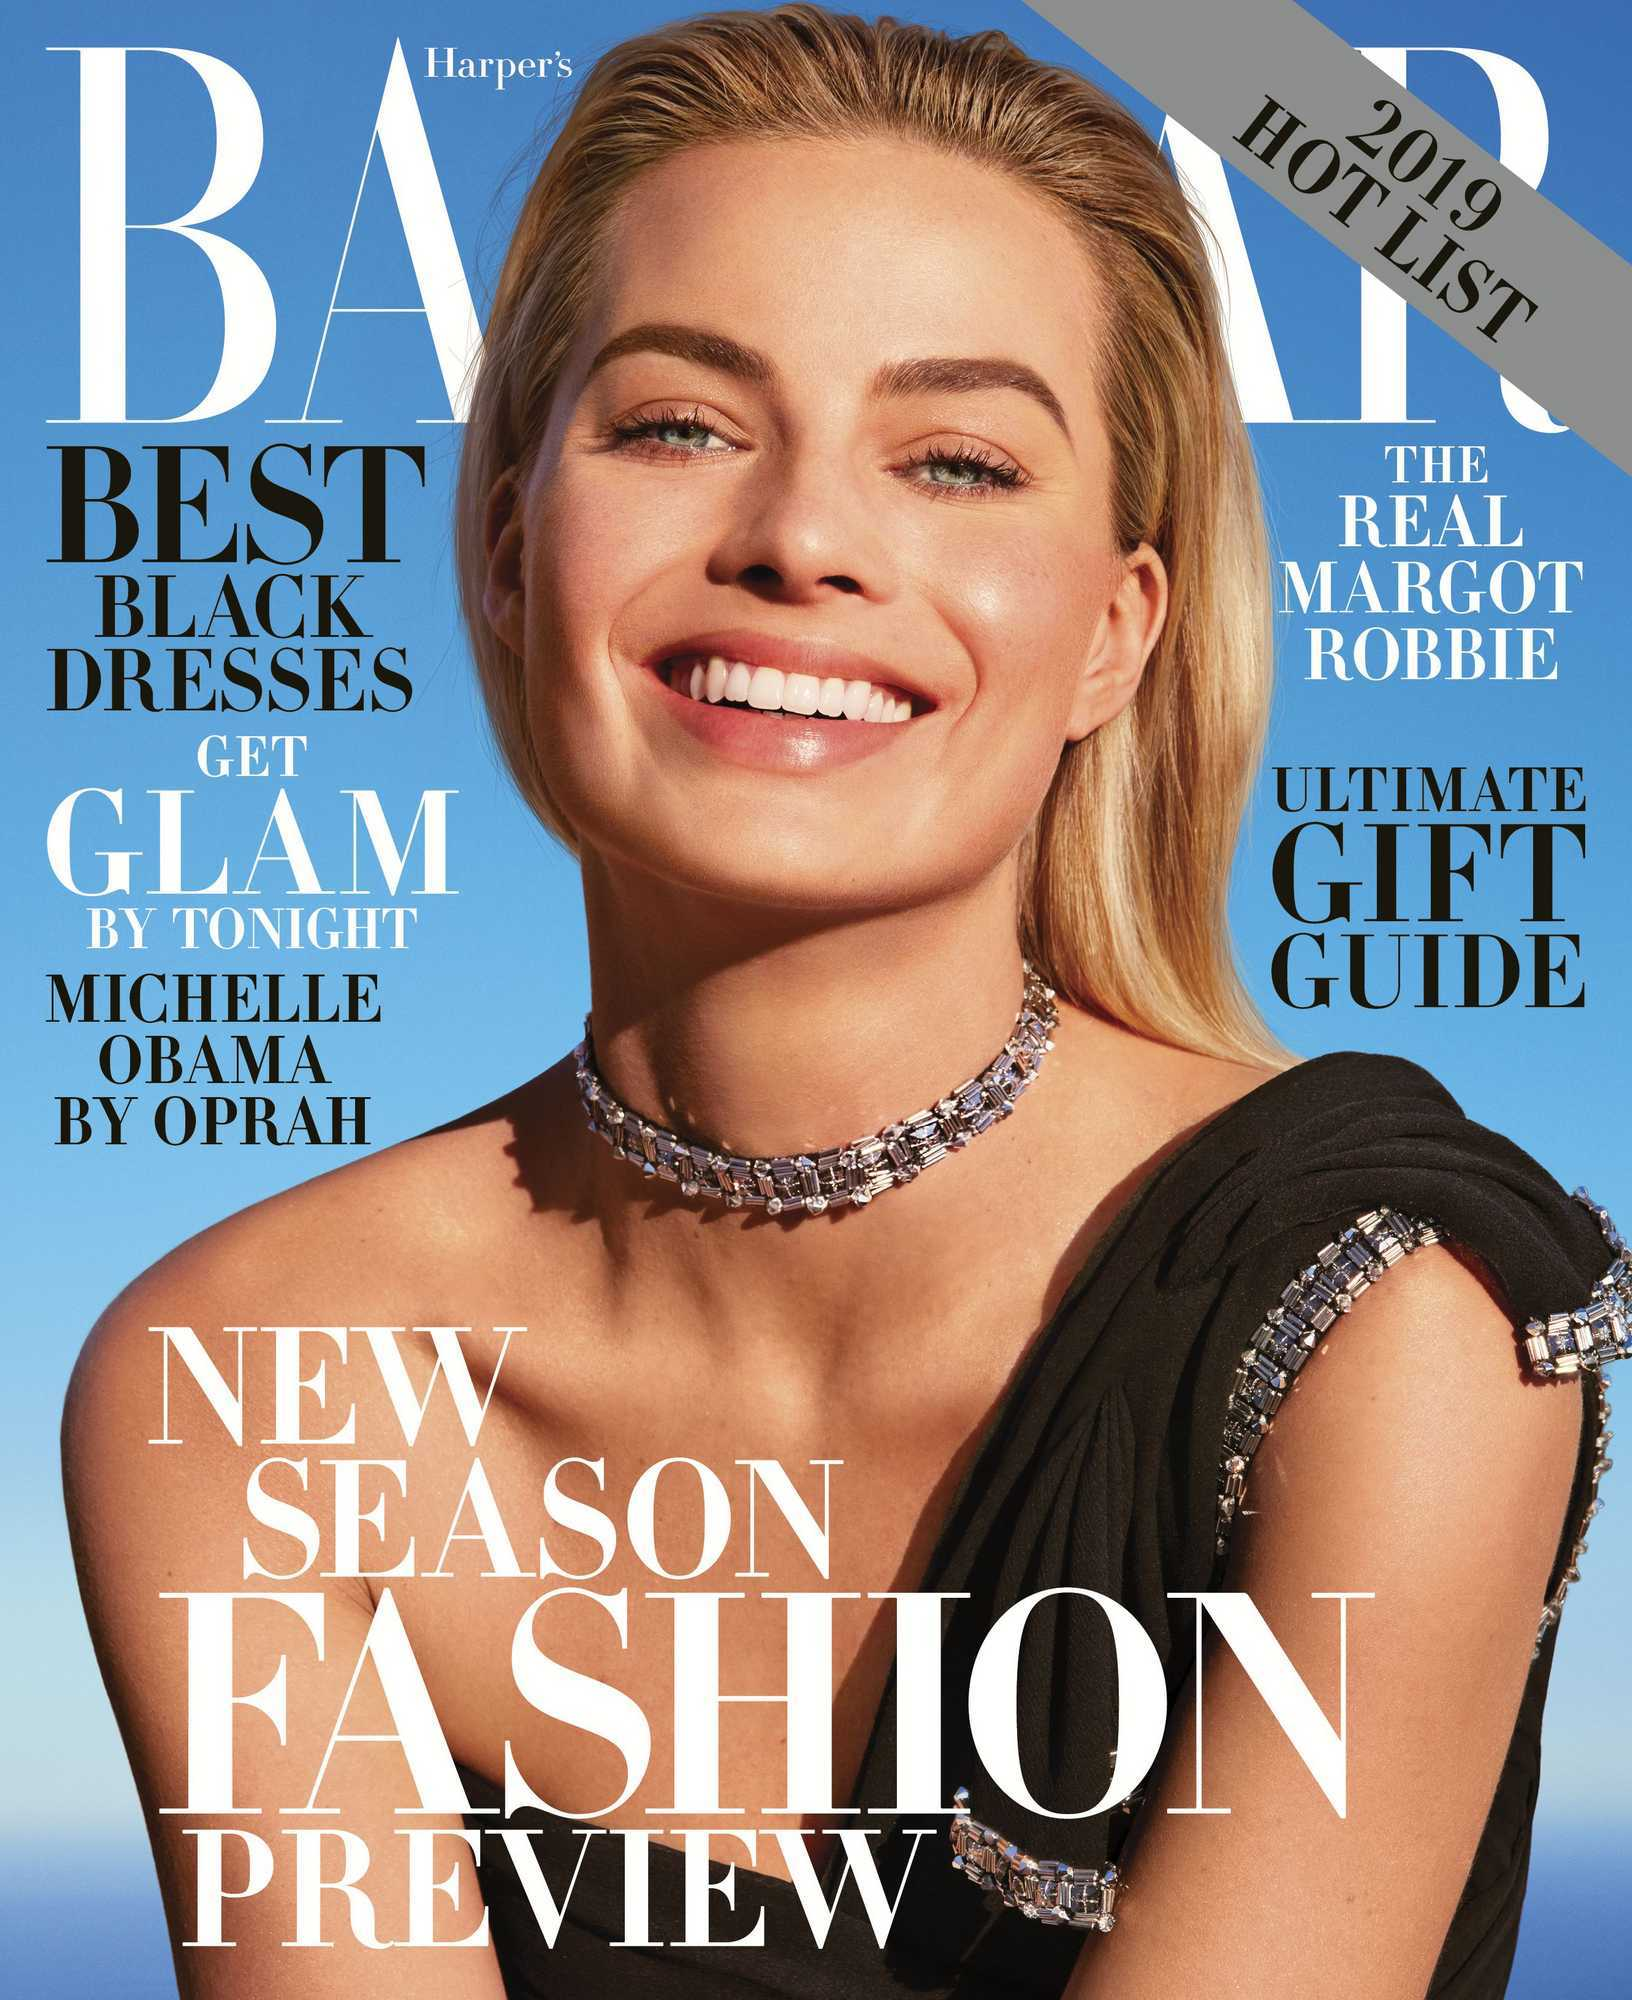 Margot-Robbie-Harpers-Bazaar-US-Magazine-December-2018January-20192.jpg